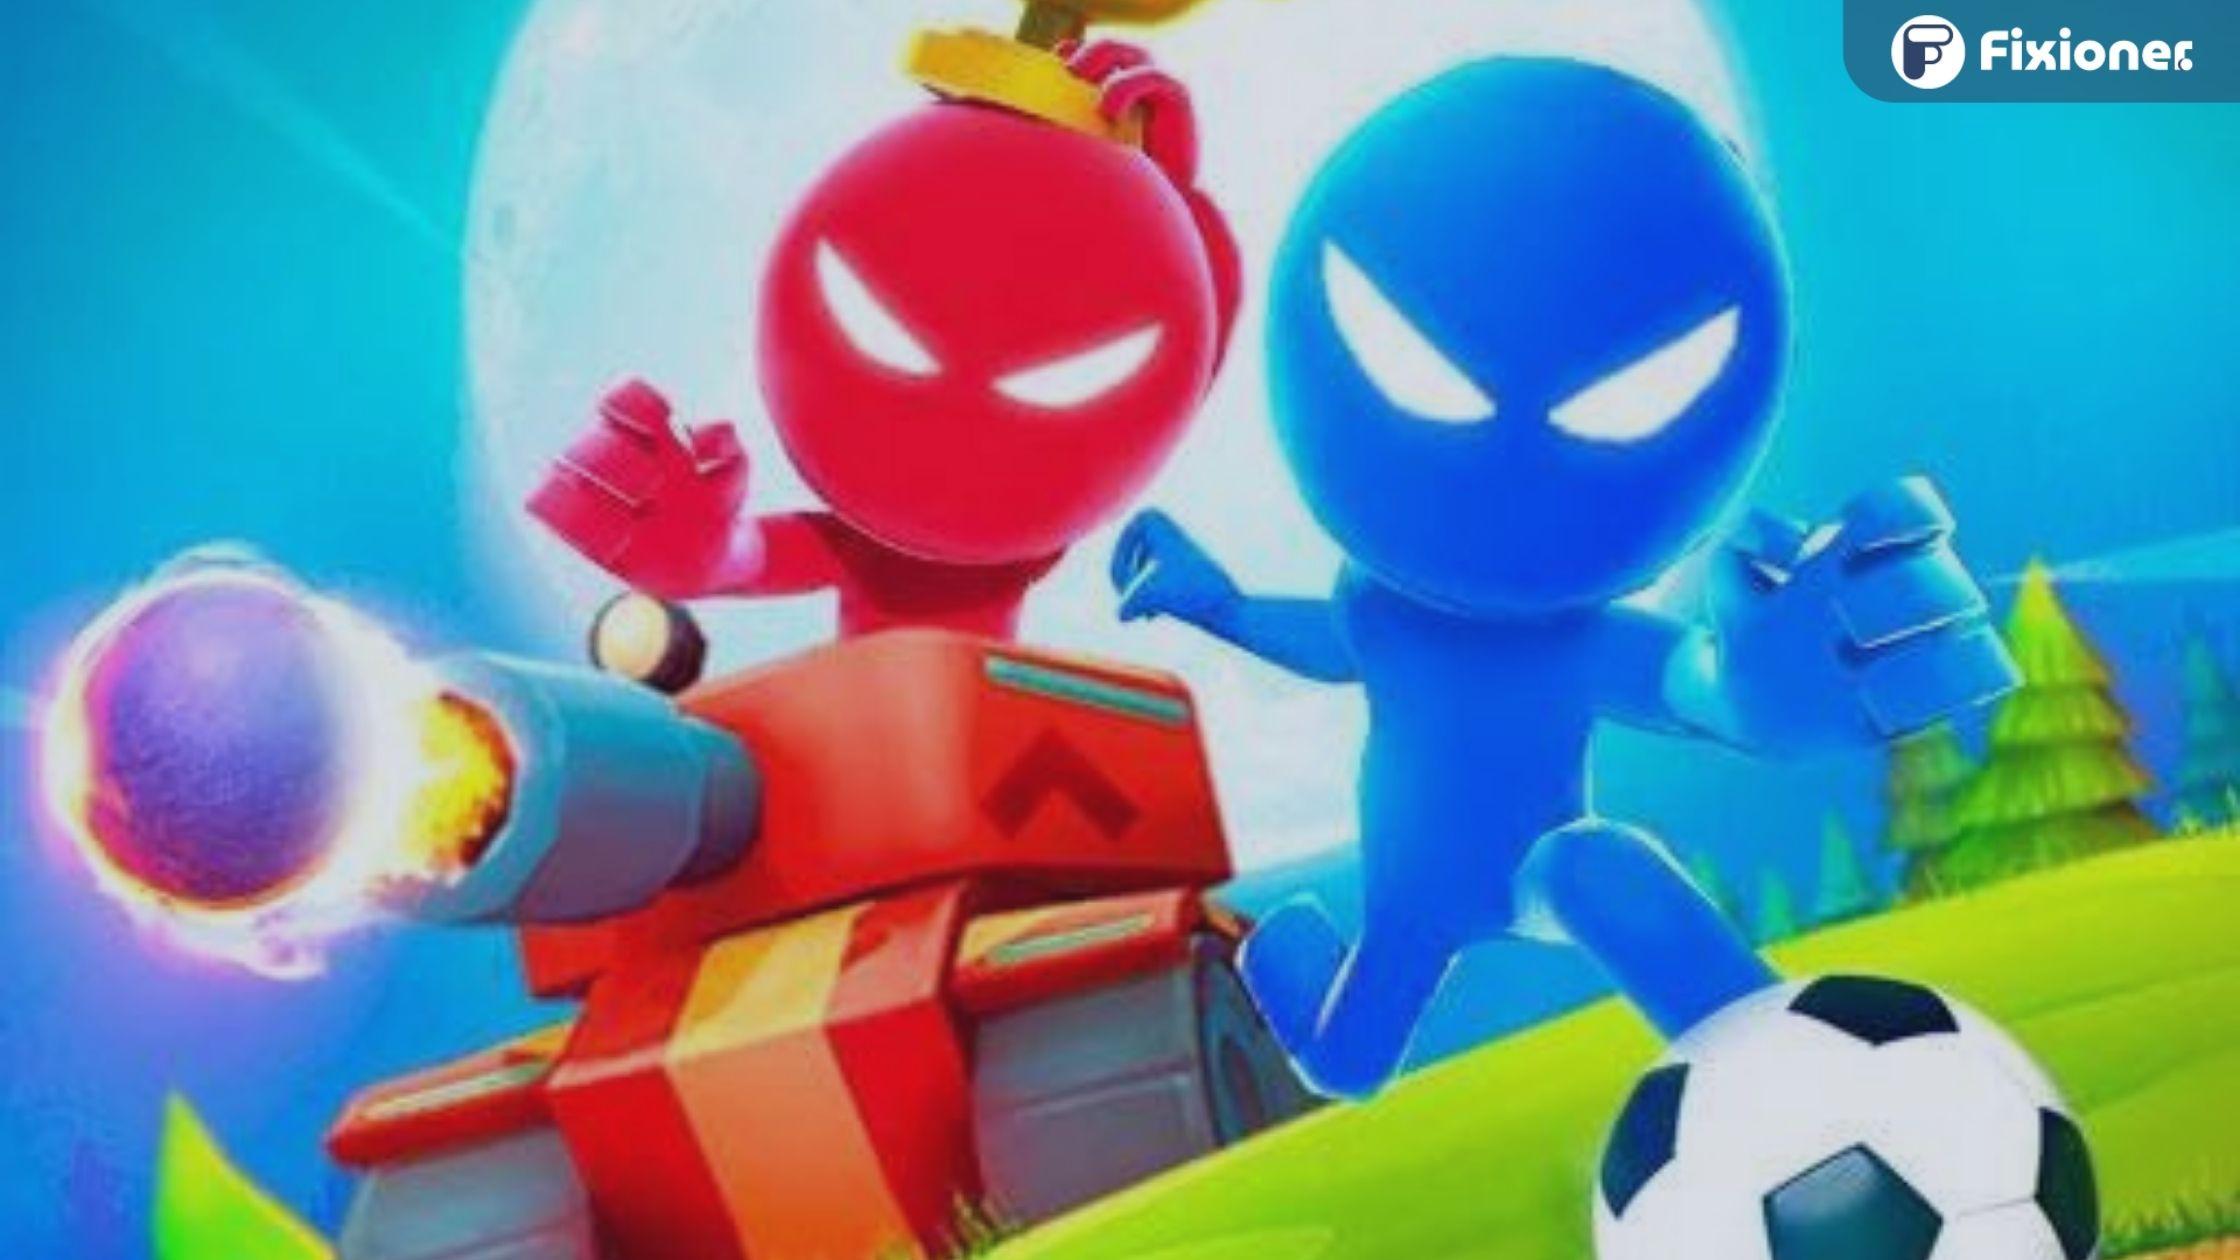 Download Stickman Party Mod APK | New Update dan Terbaru 2021